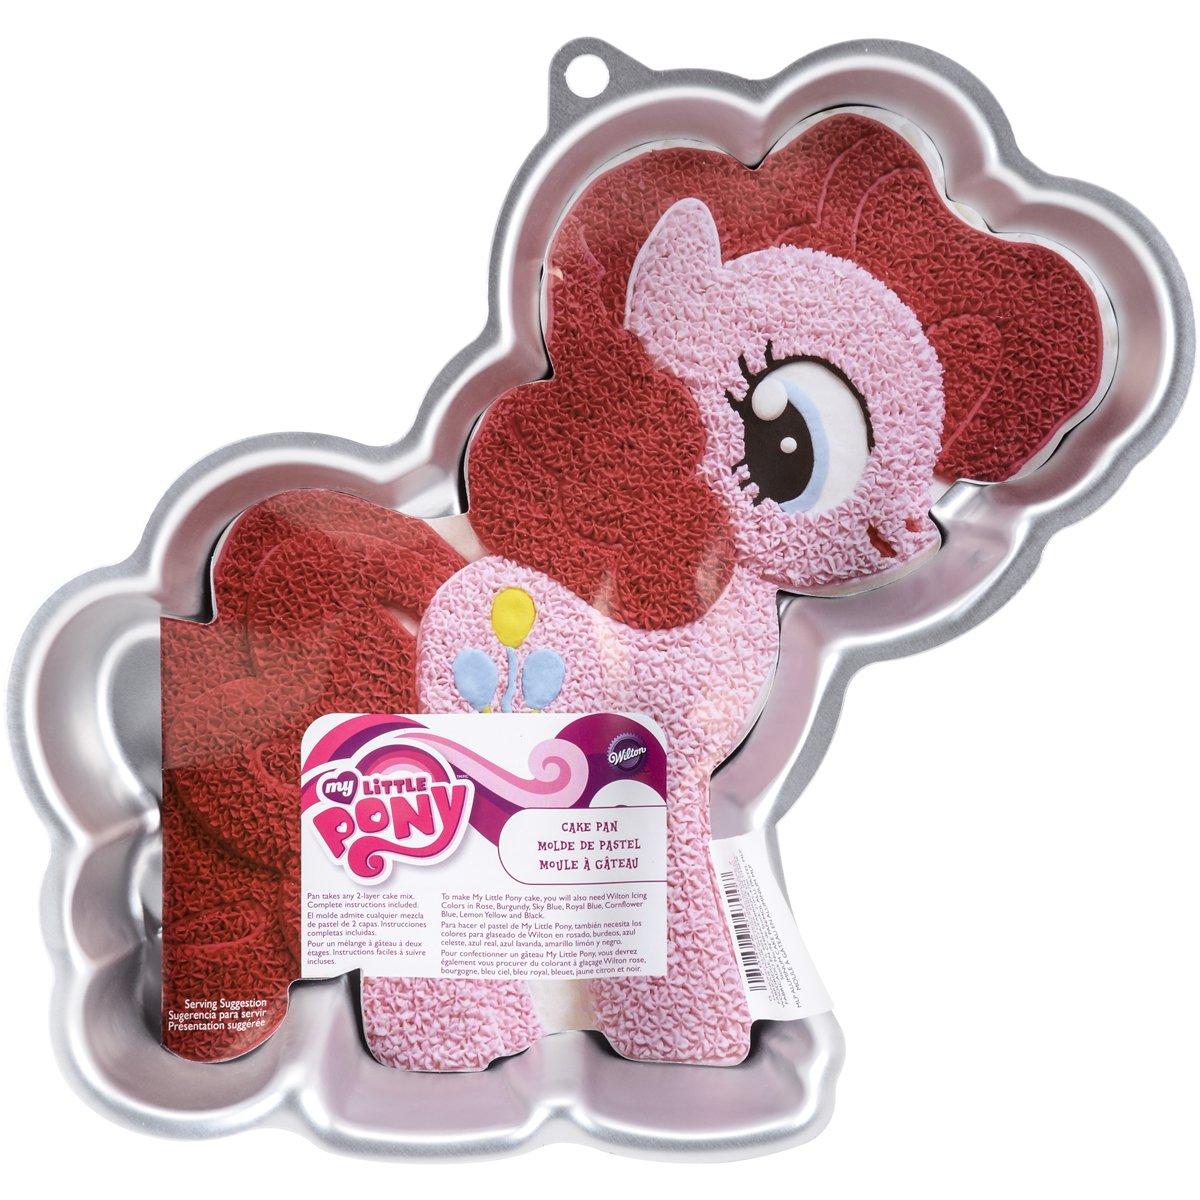 WILTON - My Little Pony Cake Pan